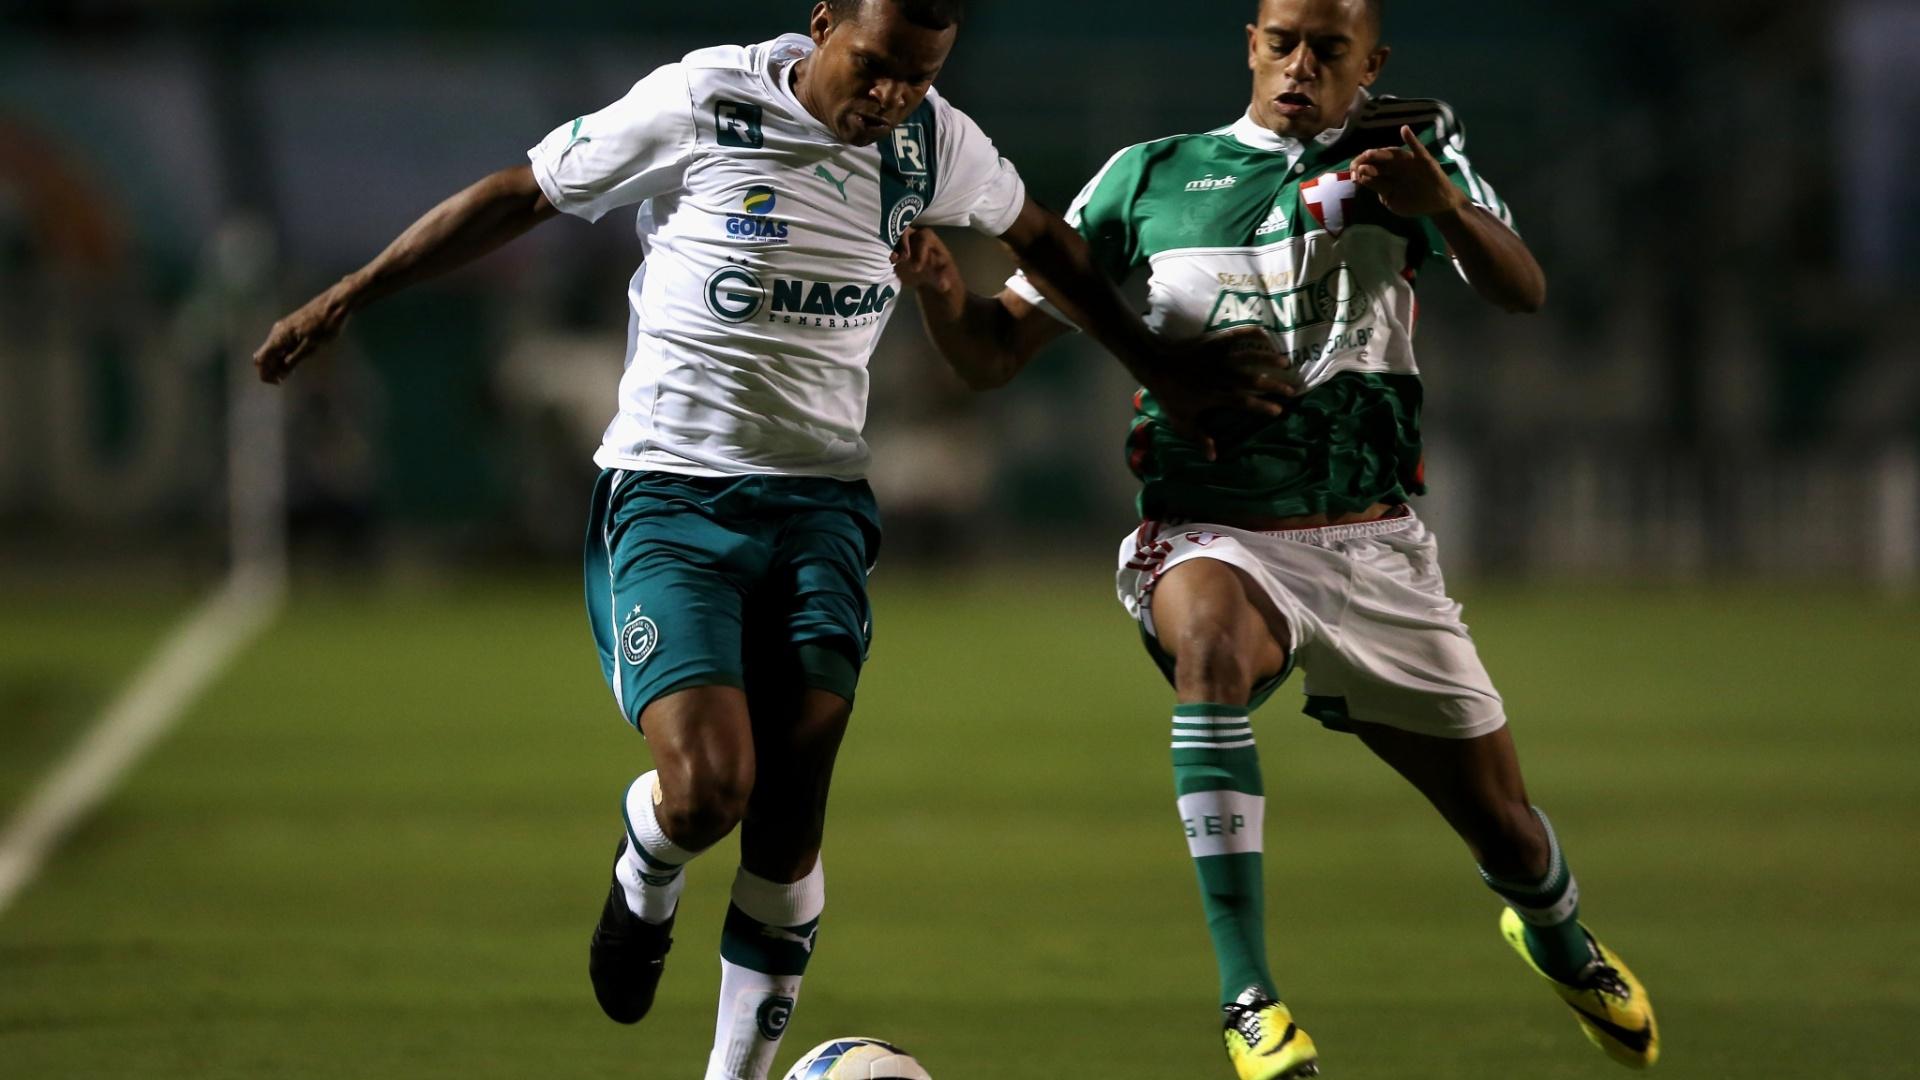 10.05.14 - Vitor, do Goiás, leva a bola enquanto é marcado por Matheus, do Palmeiras